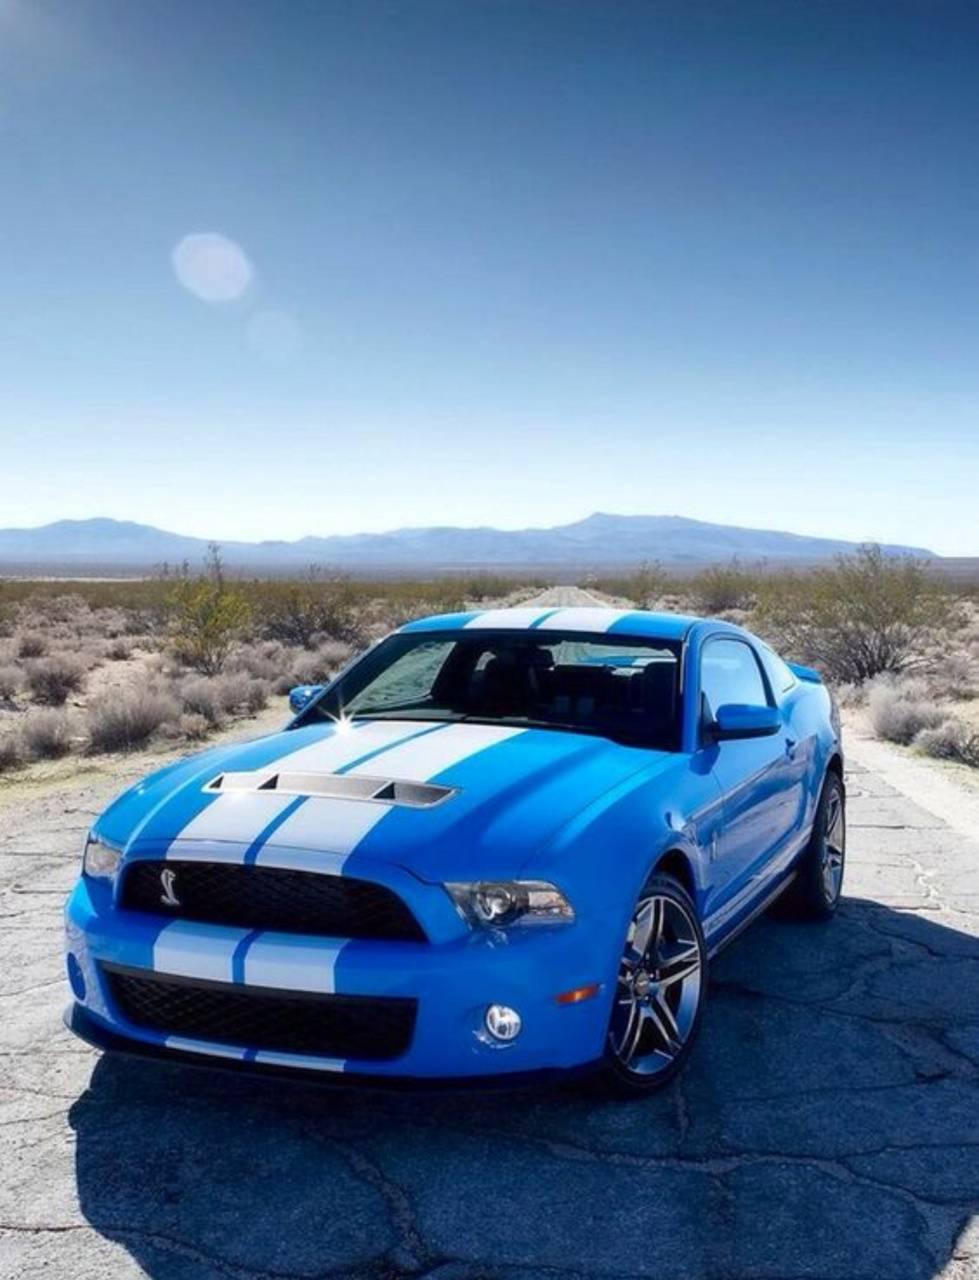 Bluewhite Mustang